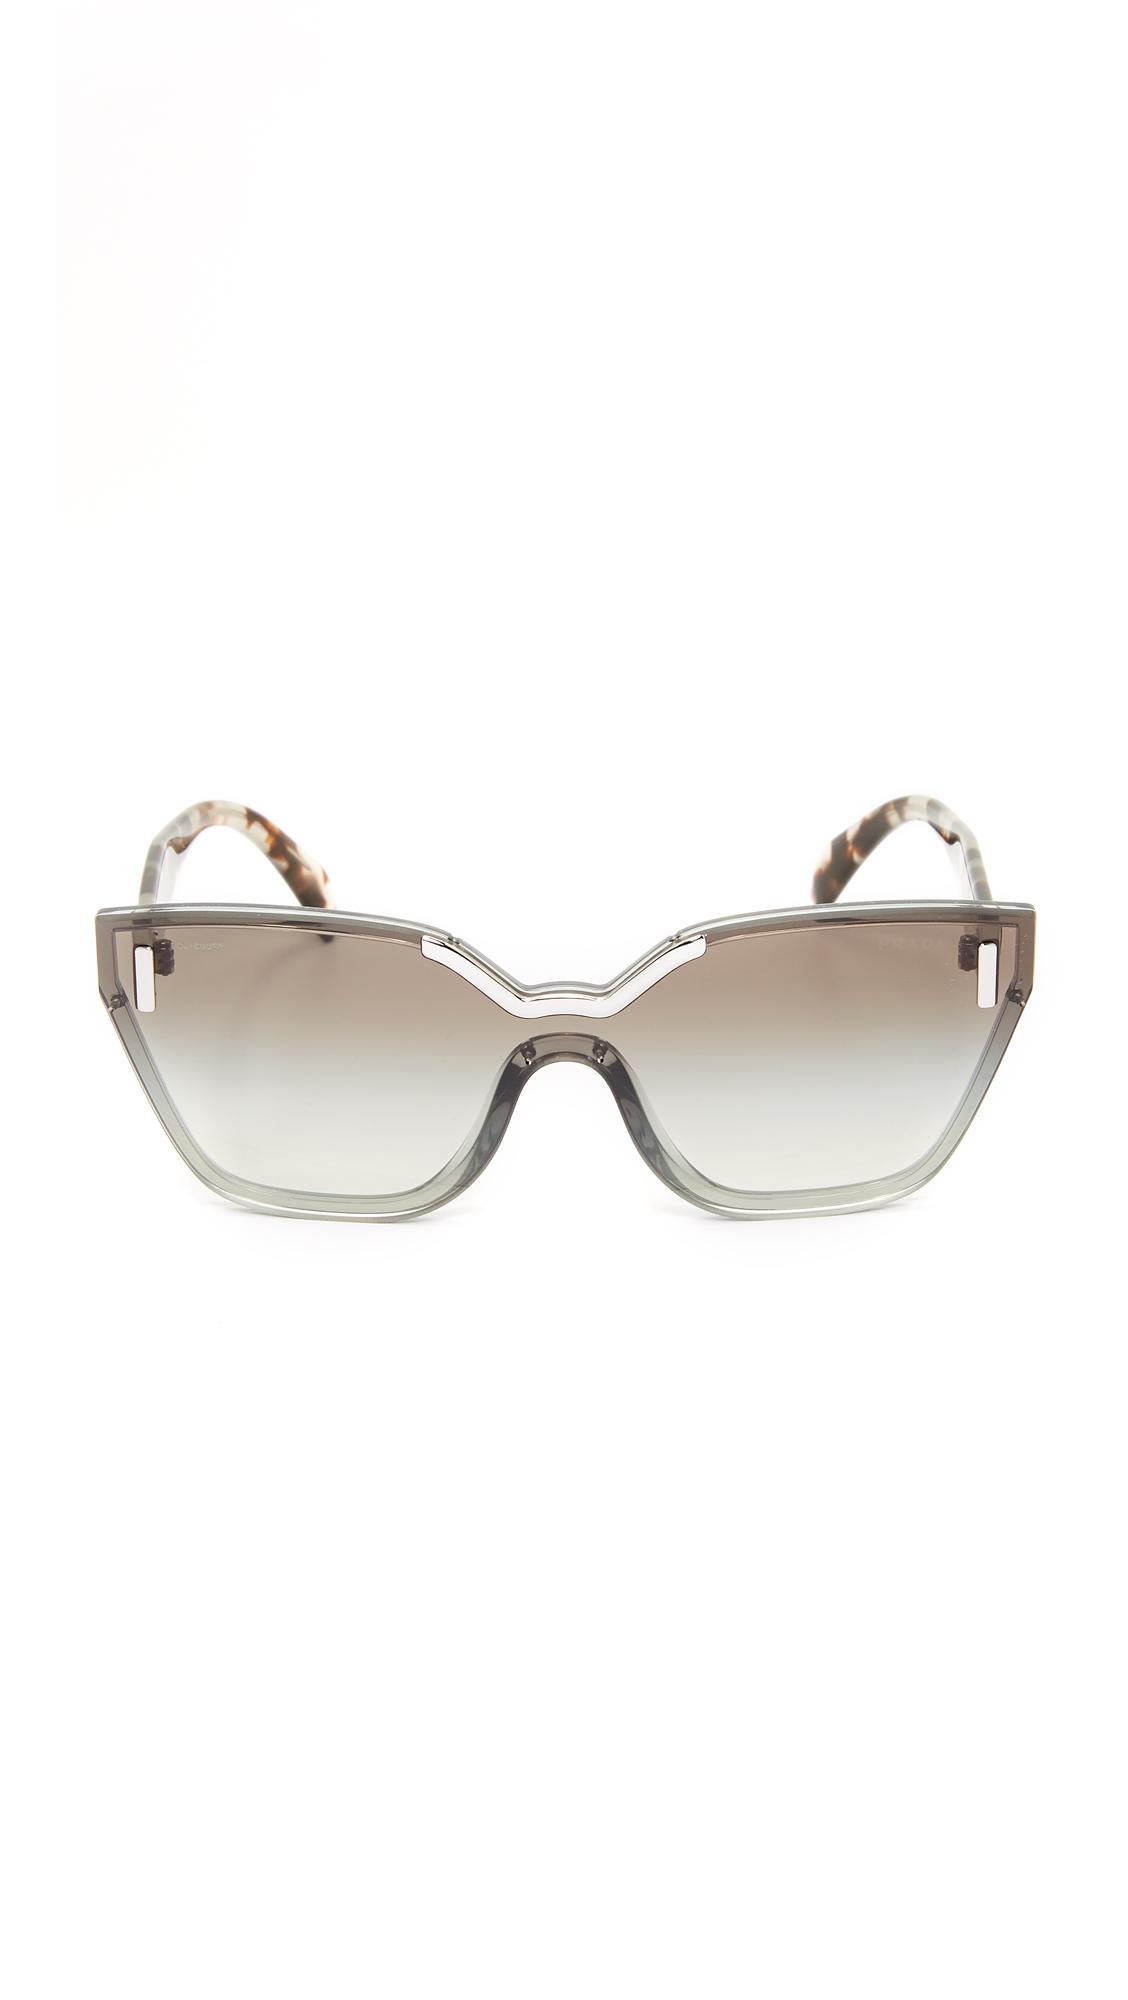 baa0048fbc Prada Hide Catwalk Sunglasses | SHOPBOP